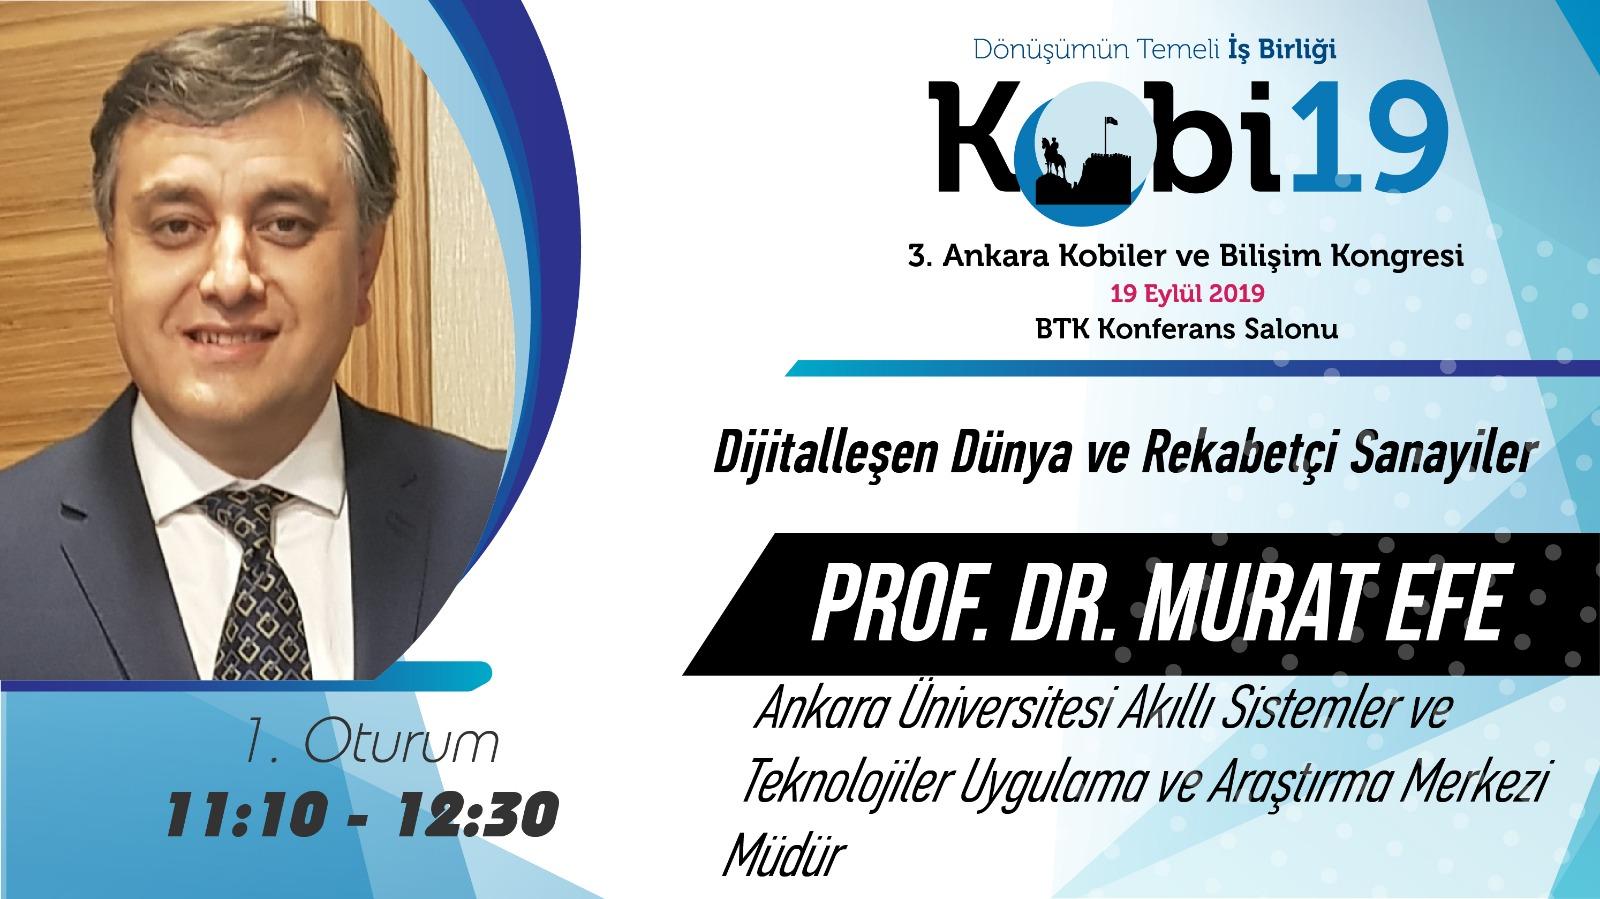 Prof. Dr. Murat Efe - 3. Ankara Kobiler ve Bilişim Konferansı 2019